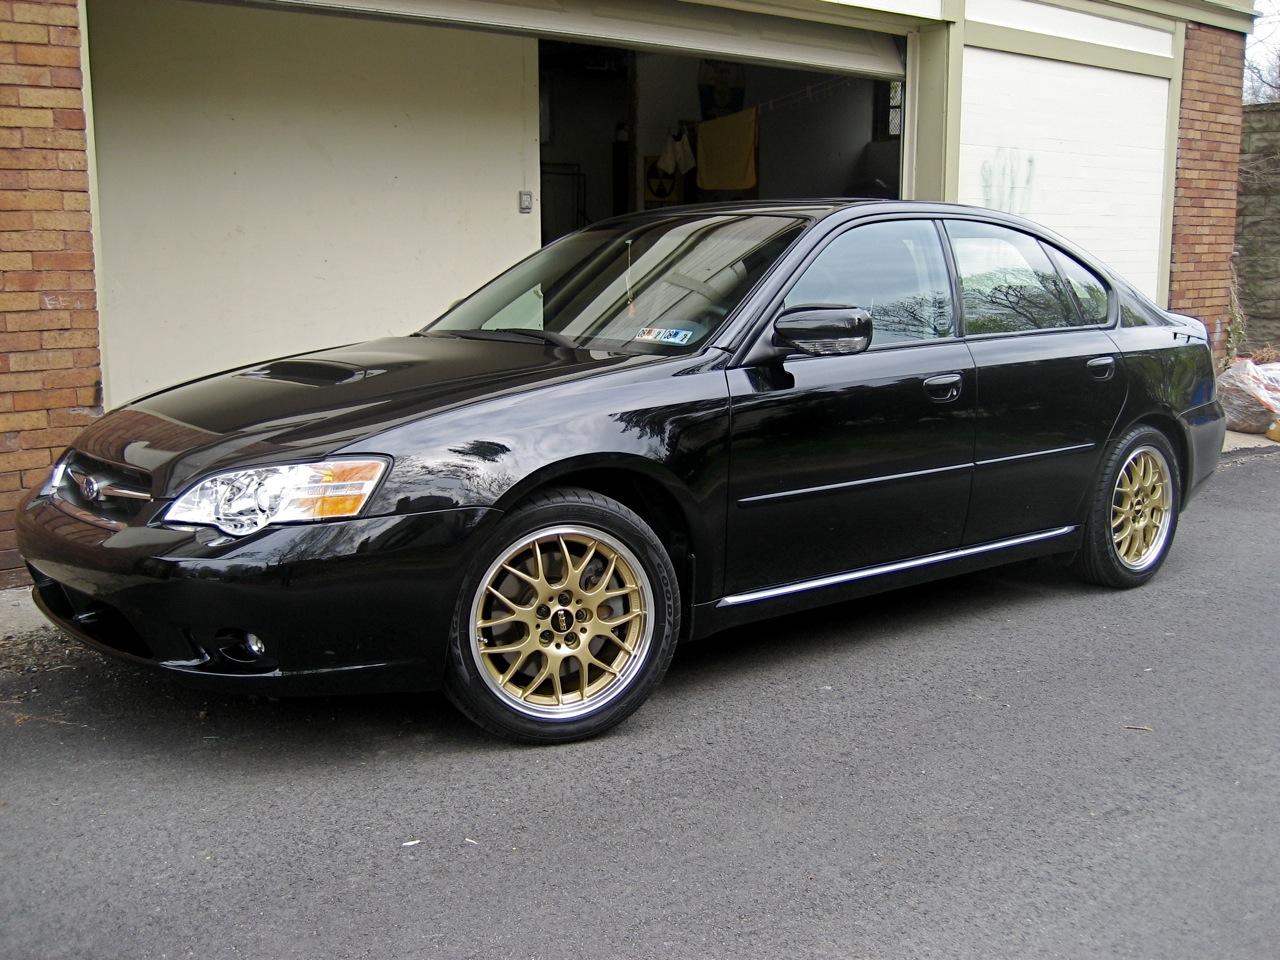 "Used Tires Columbus Ohio >> GI: BBS RGR 17x7.5"" (gold w/ polished lip) & Goodyear Eagle F1 GS-D3 (225/45R17) - Subaru Legacy ..."